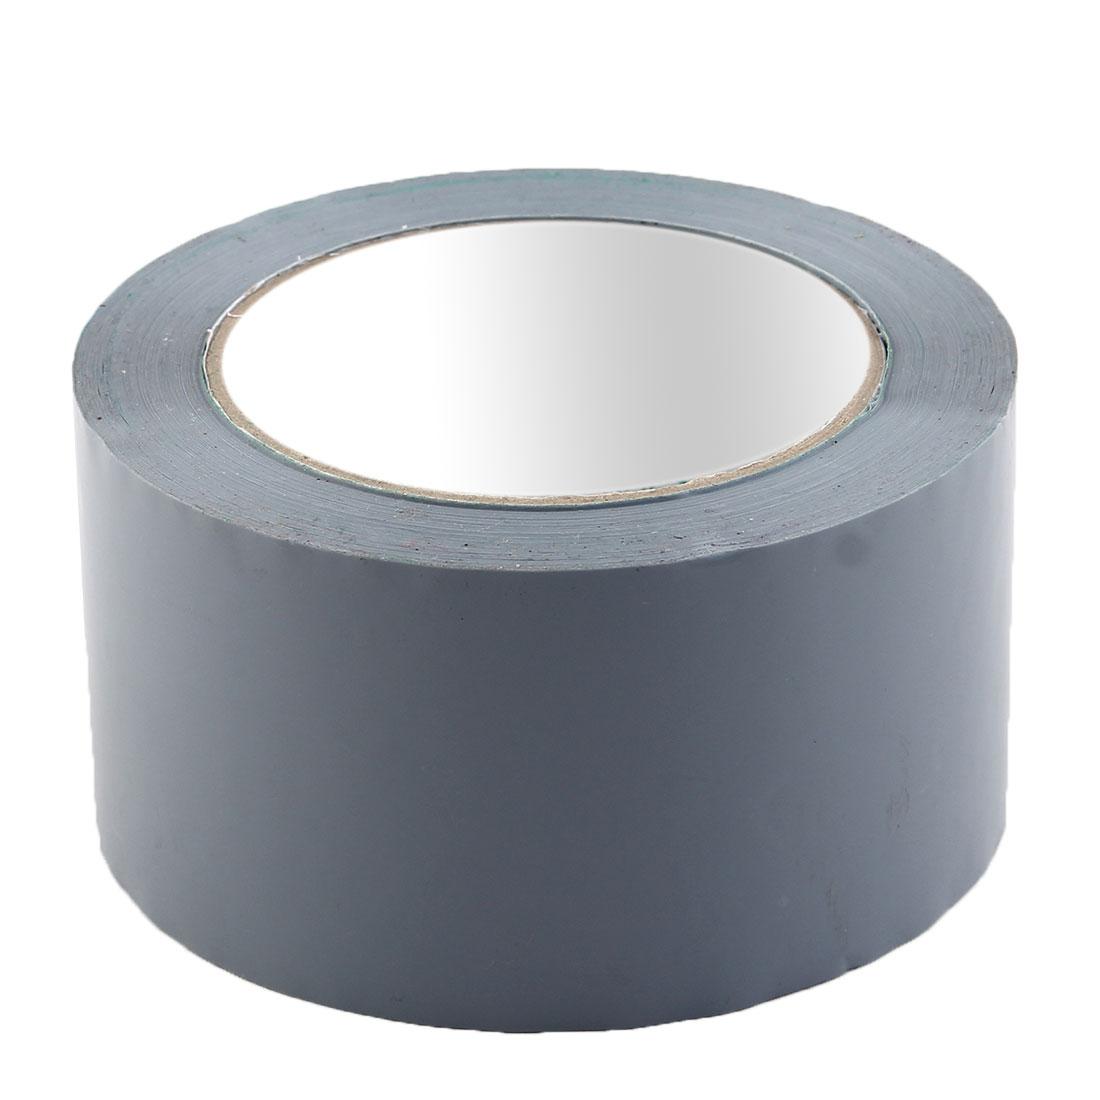 Shipping PVC Box Carton Sealing Adhesive Tape Gray 2.4'' x 98.4 Yards(295.3 Ft)